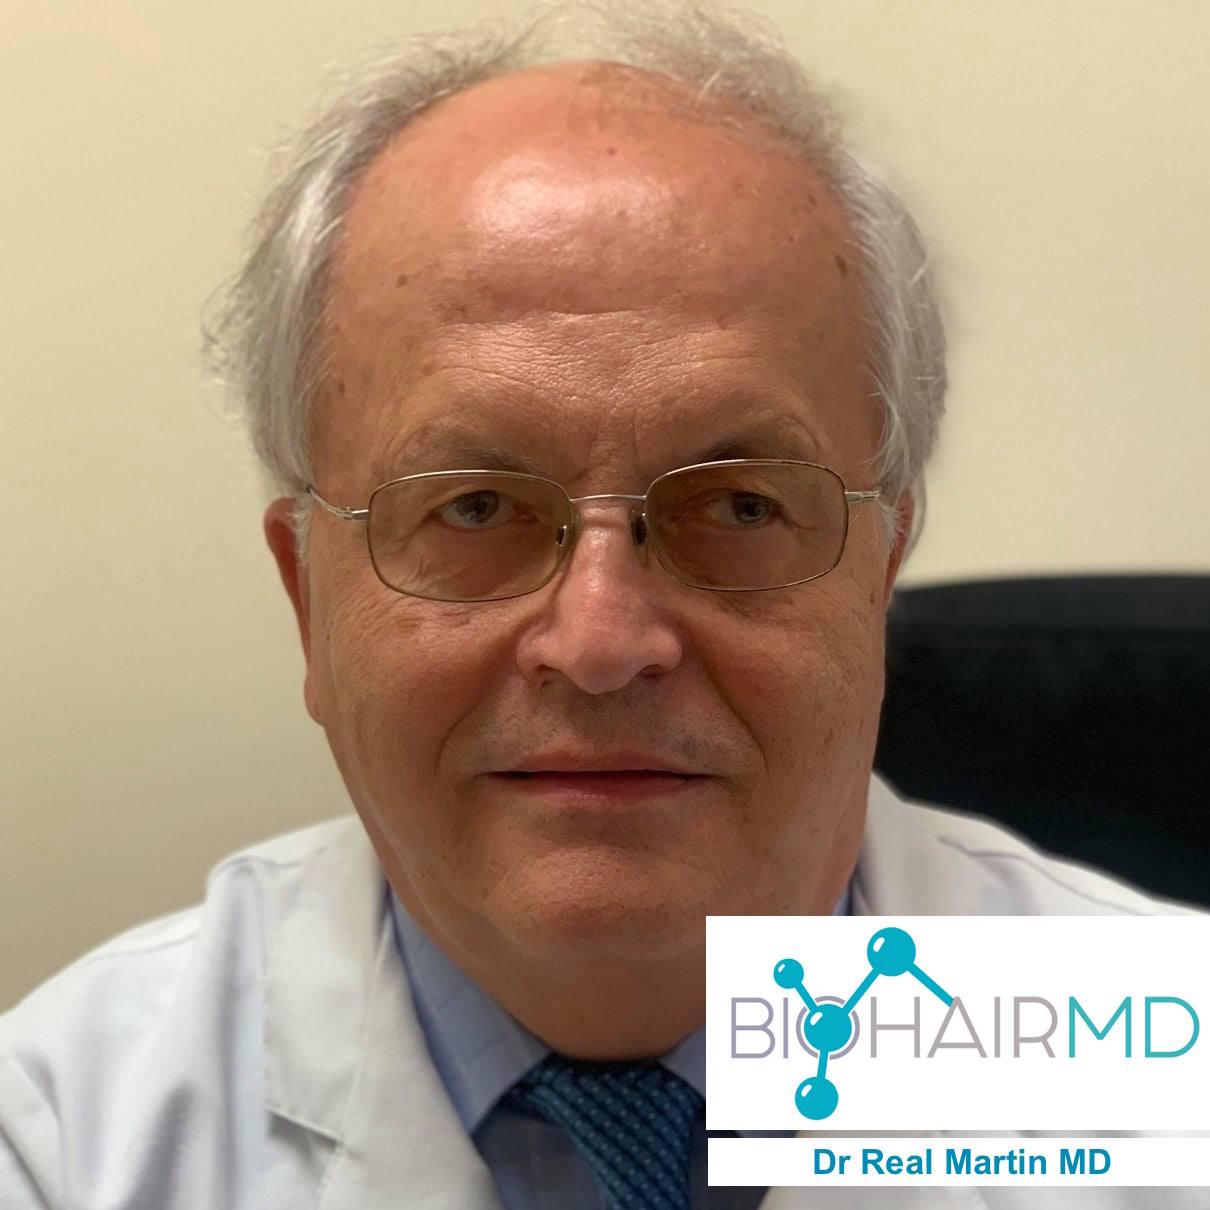 BioHairMD Introduces Revolutionary A-Z Approach To Modern Hair Restoration